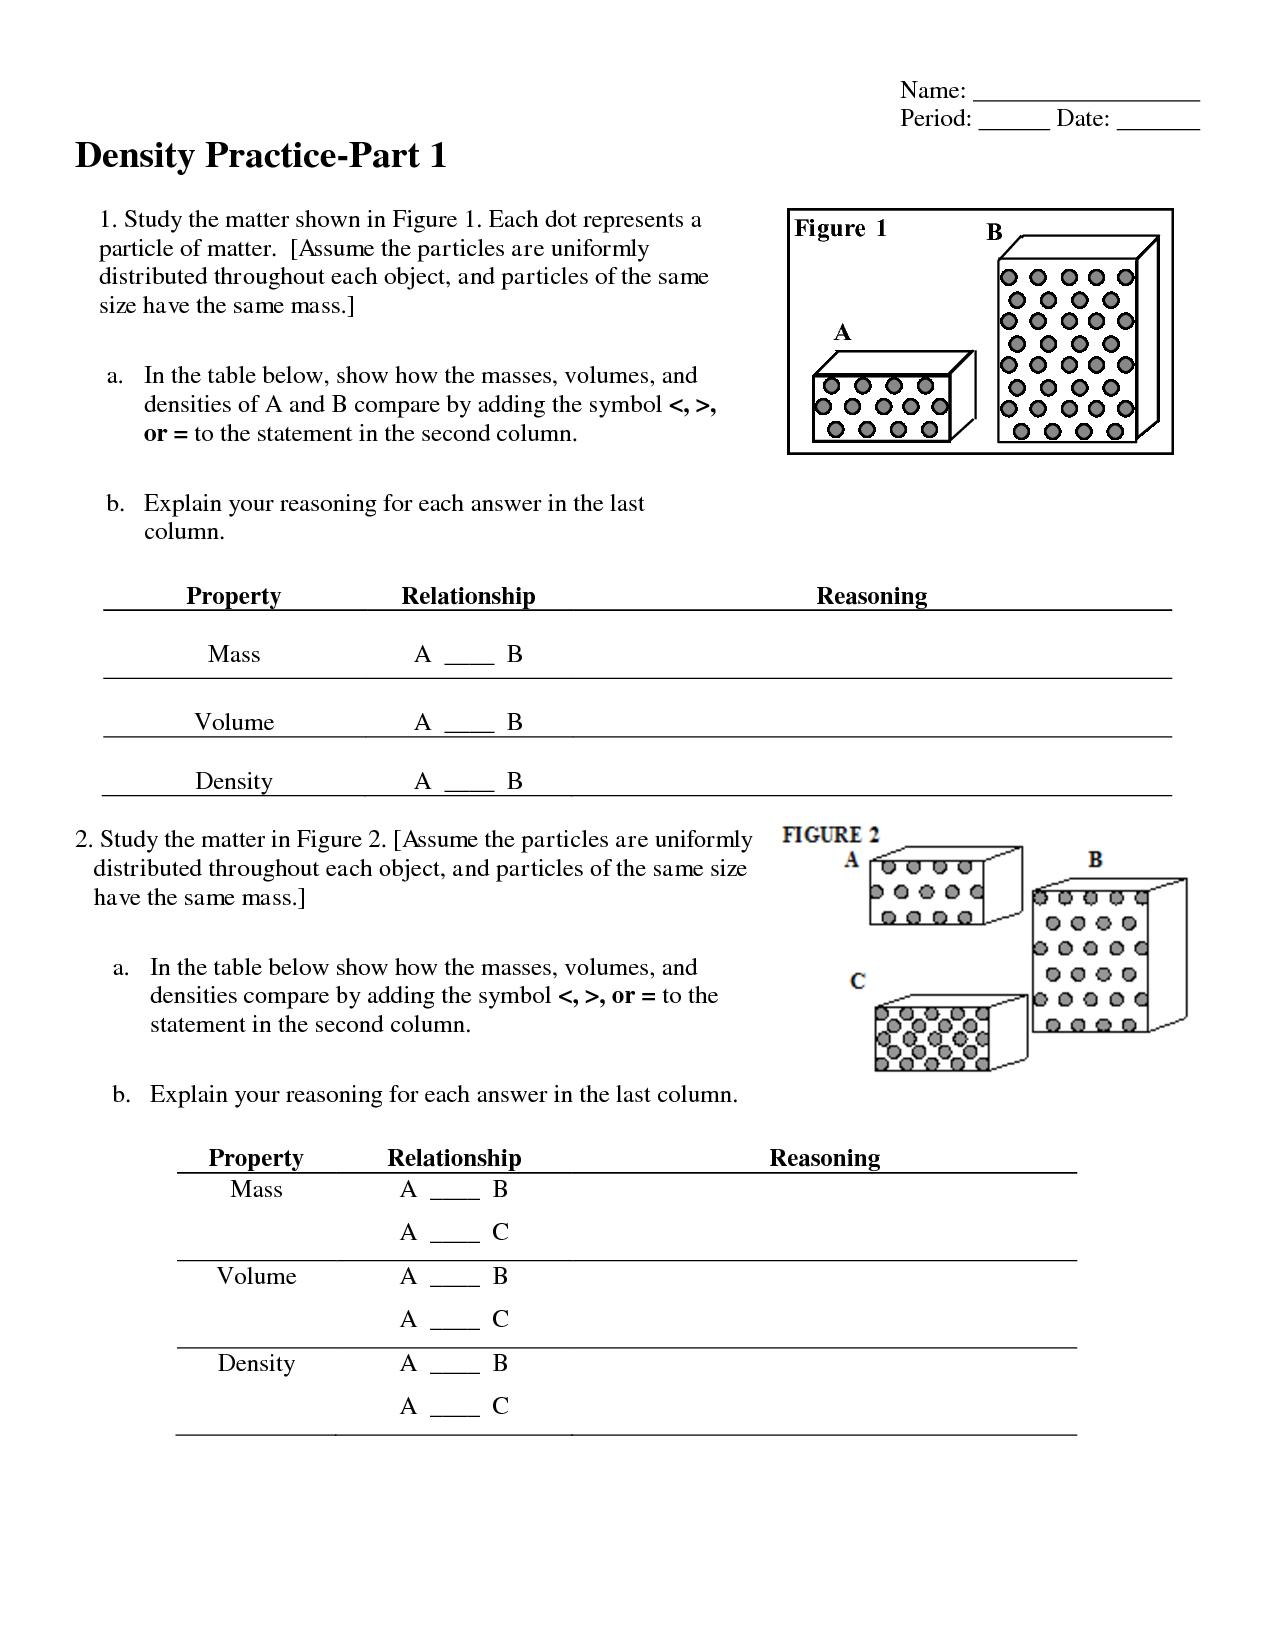 31 Chemistry Specific Heat Worksheet Answers - Worksheet ...